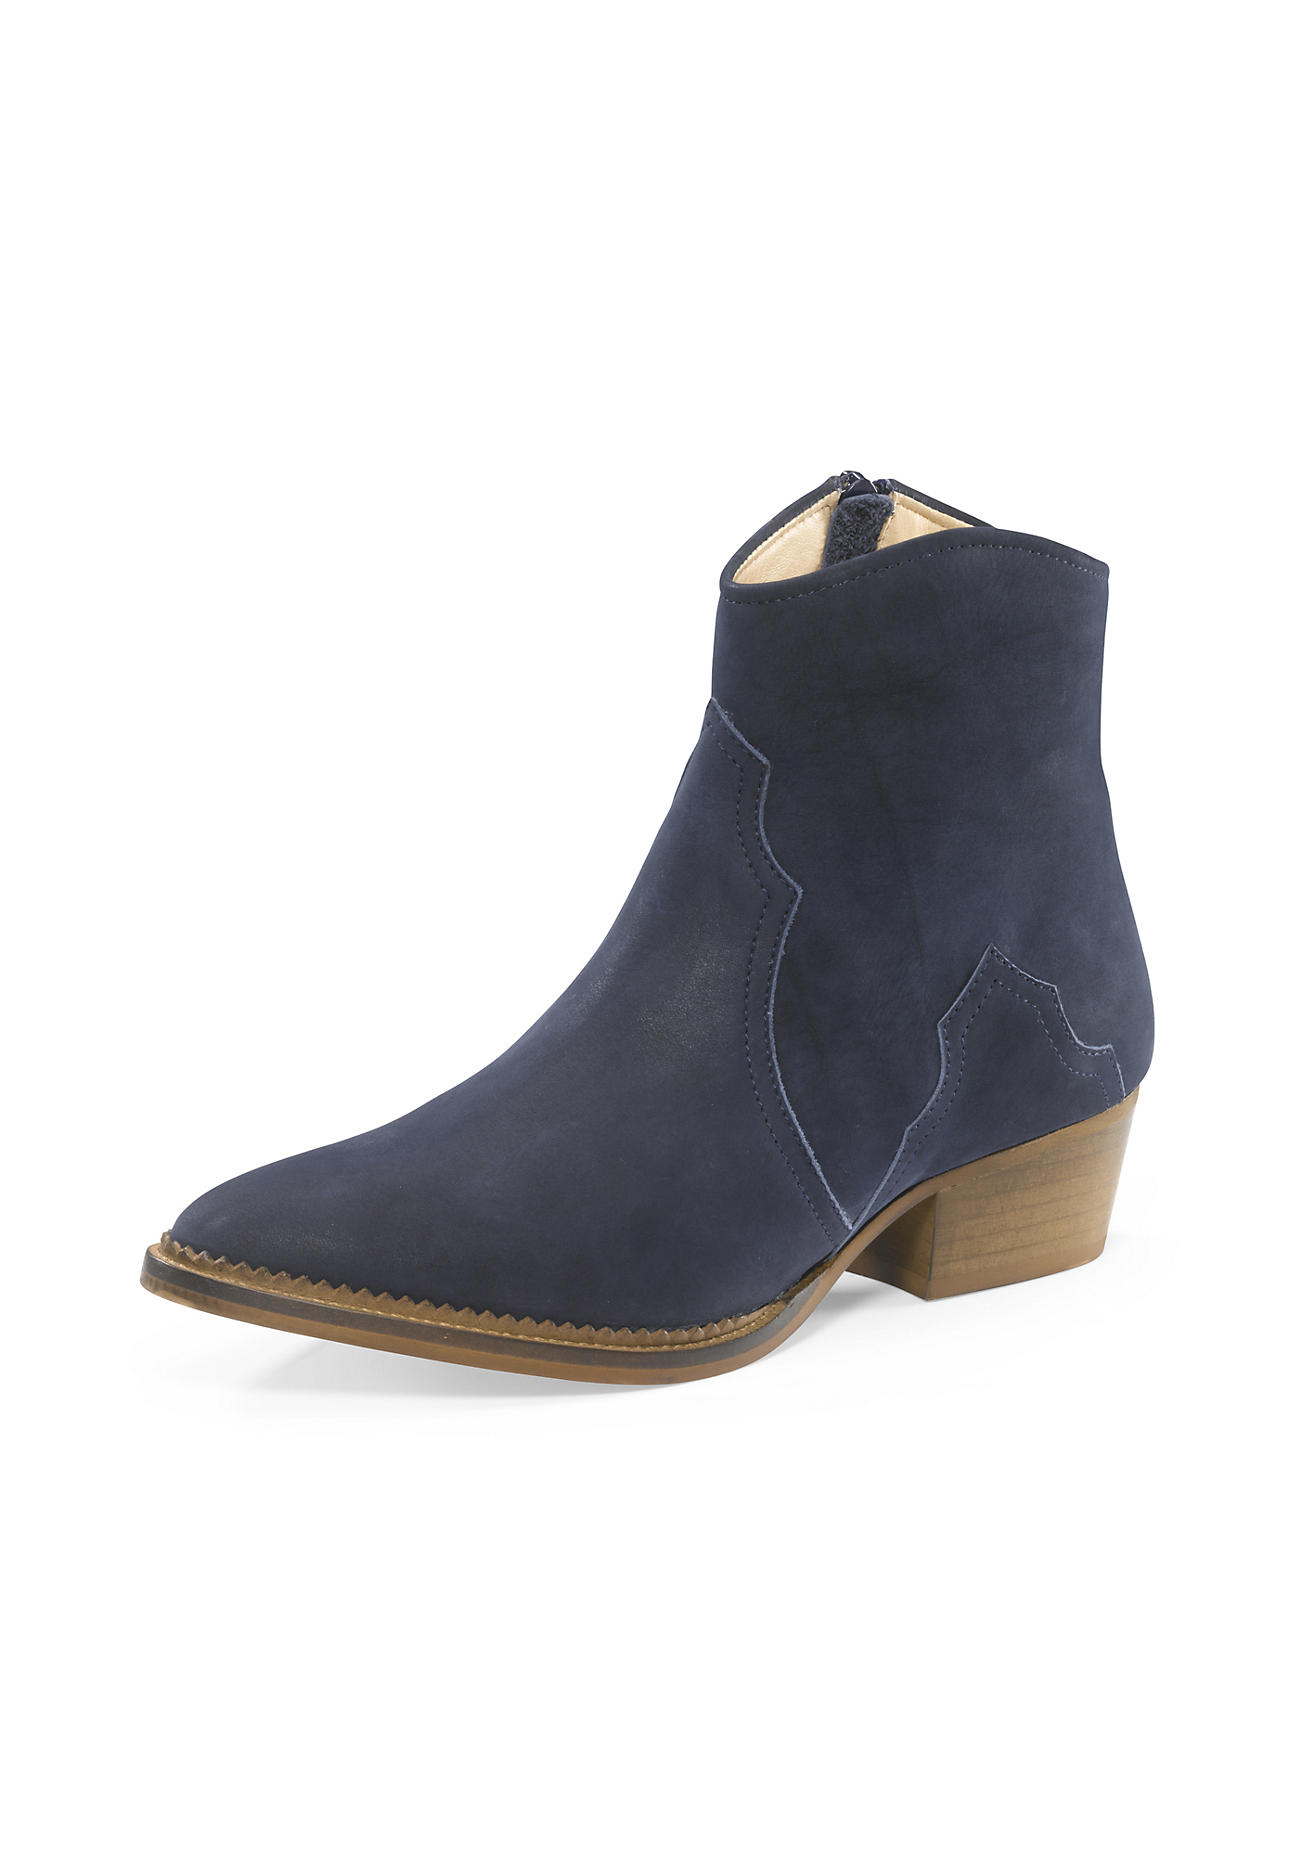 Stiefel - hessnatur Damen Damen Western Stiefelette aus Leder – blau –  - Onlineshop Hessnatur